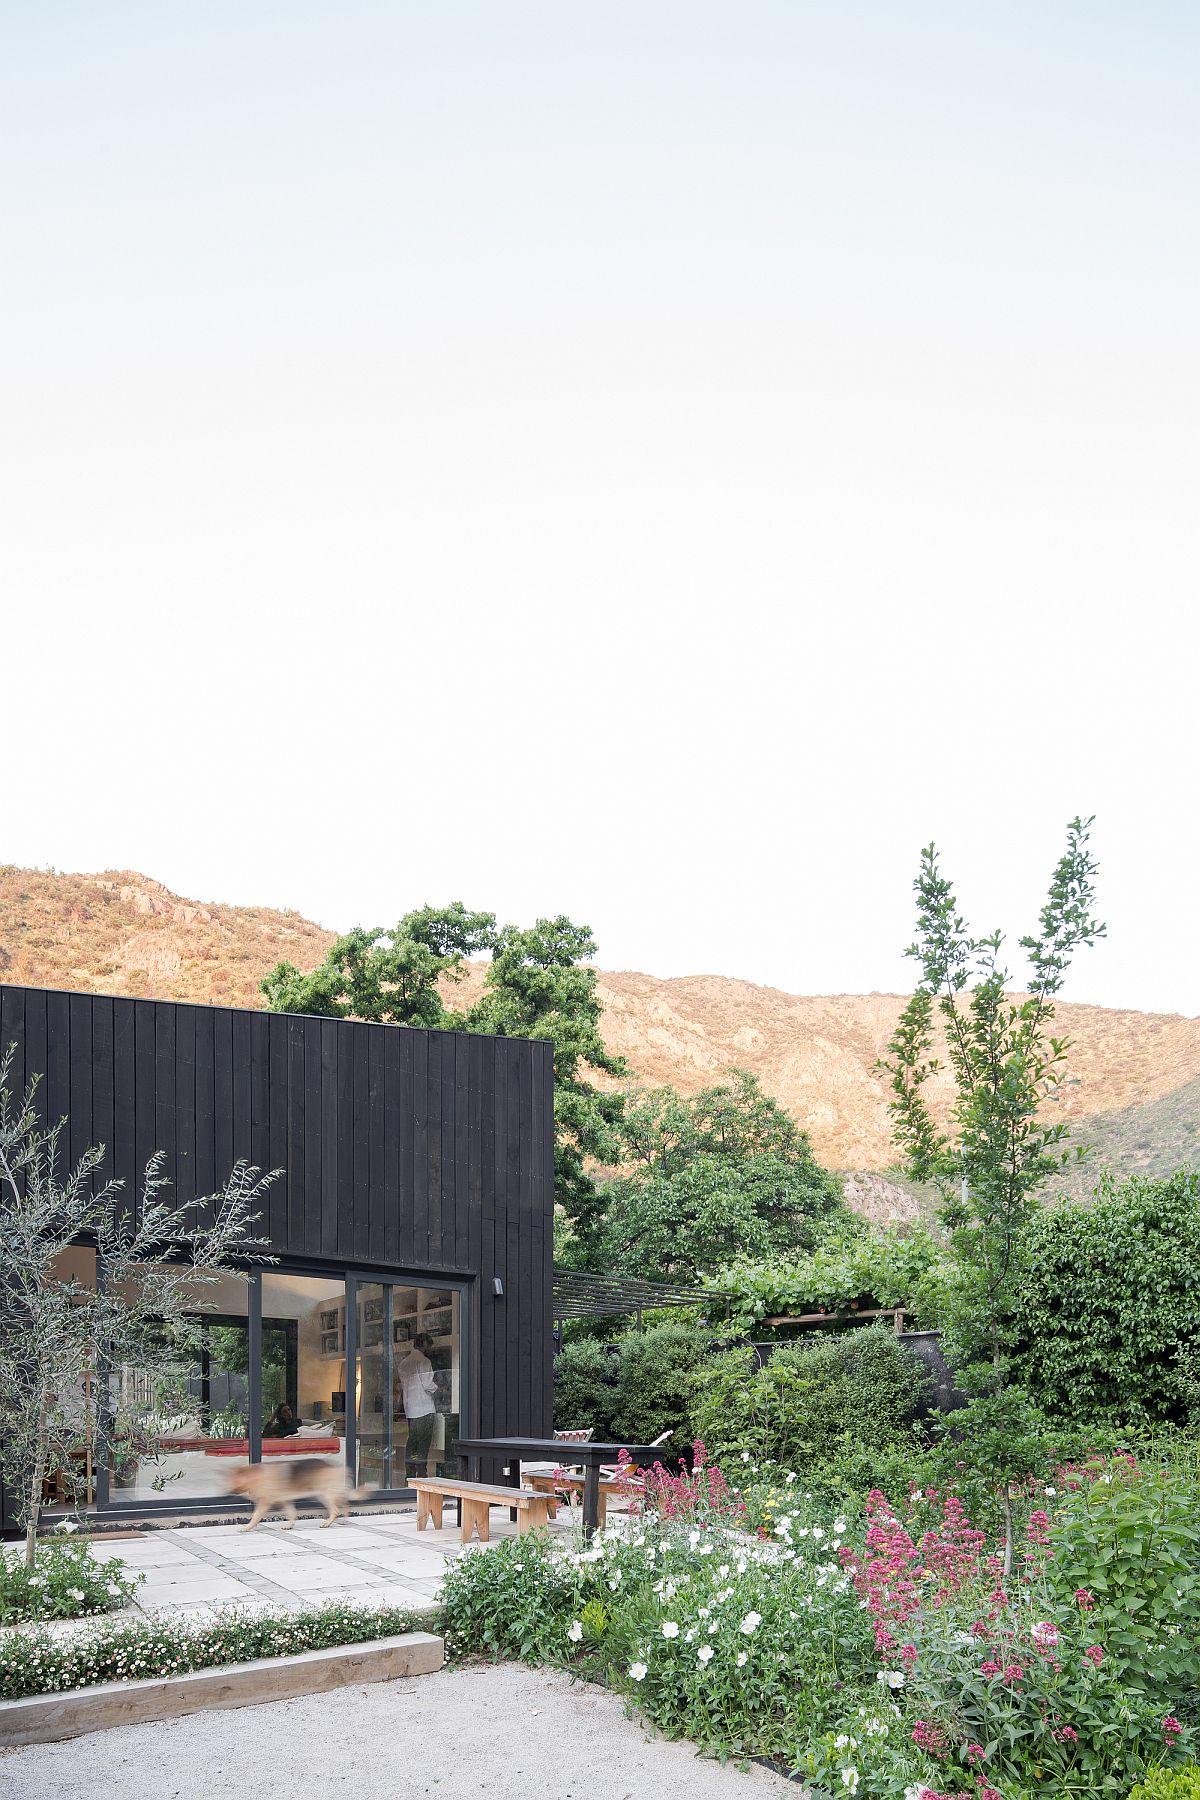 Lush-green-landscape-aruund-the-El-Arrayan-House-in-Santiago-73186